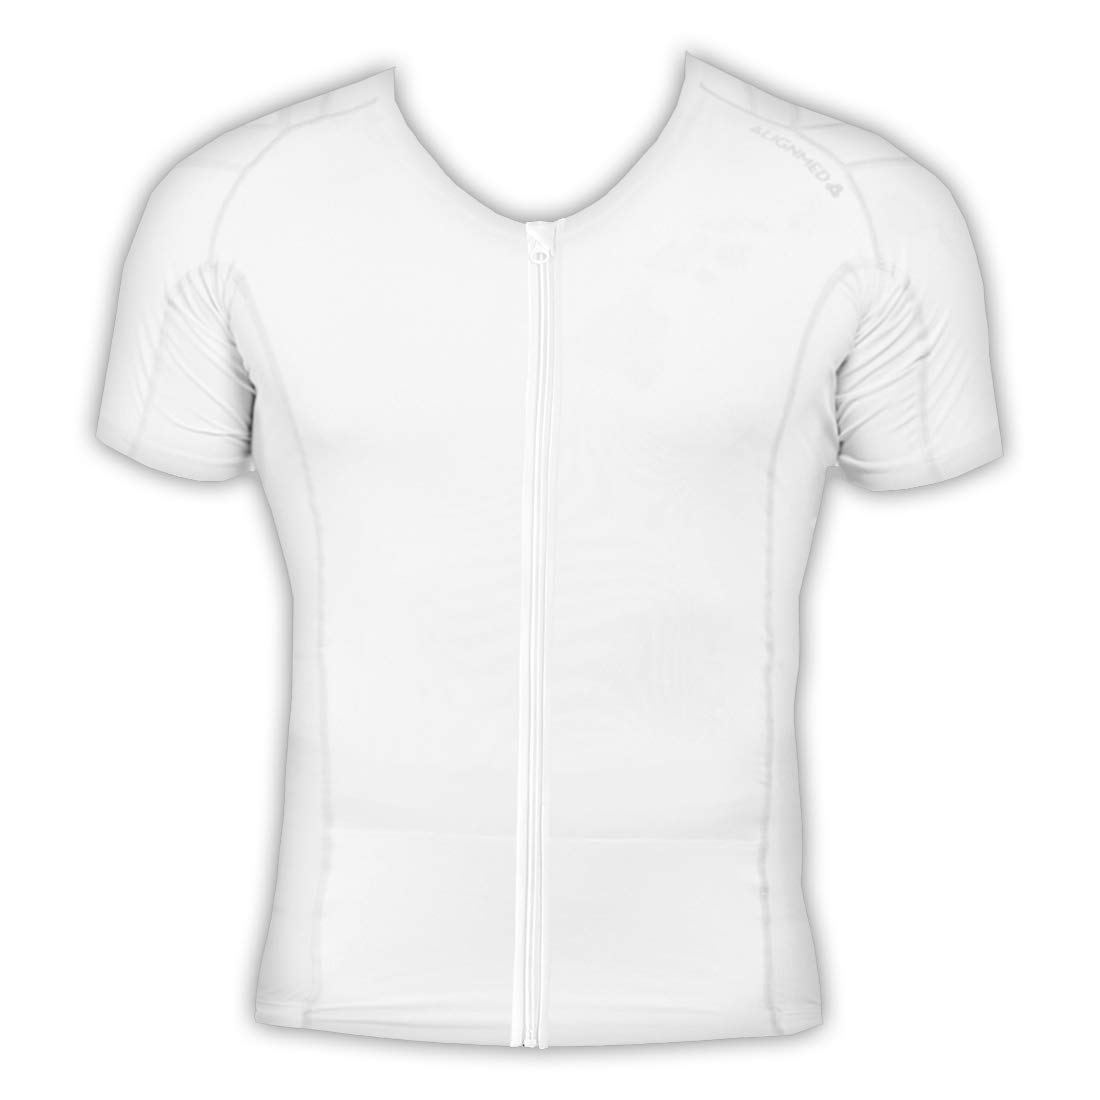 ALIGNMED Posture Shirt 2.0 Zipper - Mens - White - S